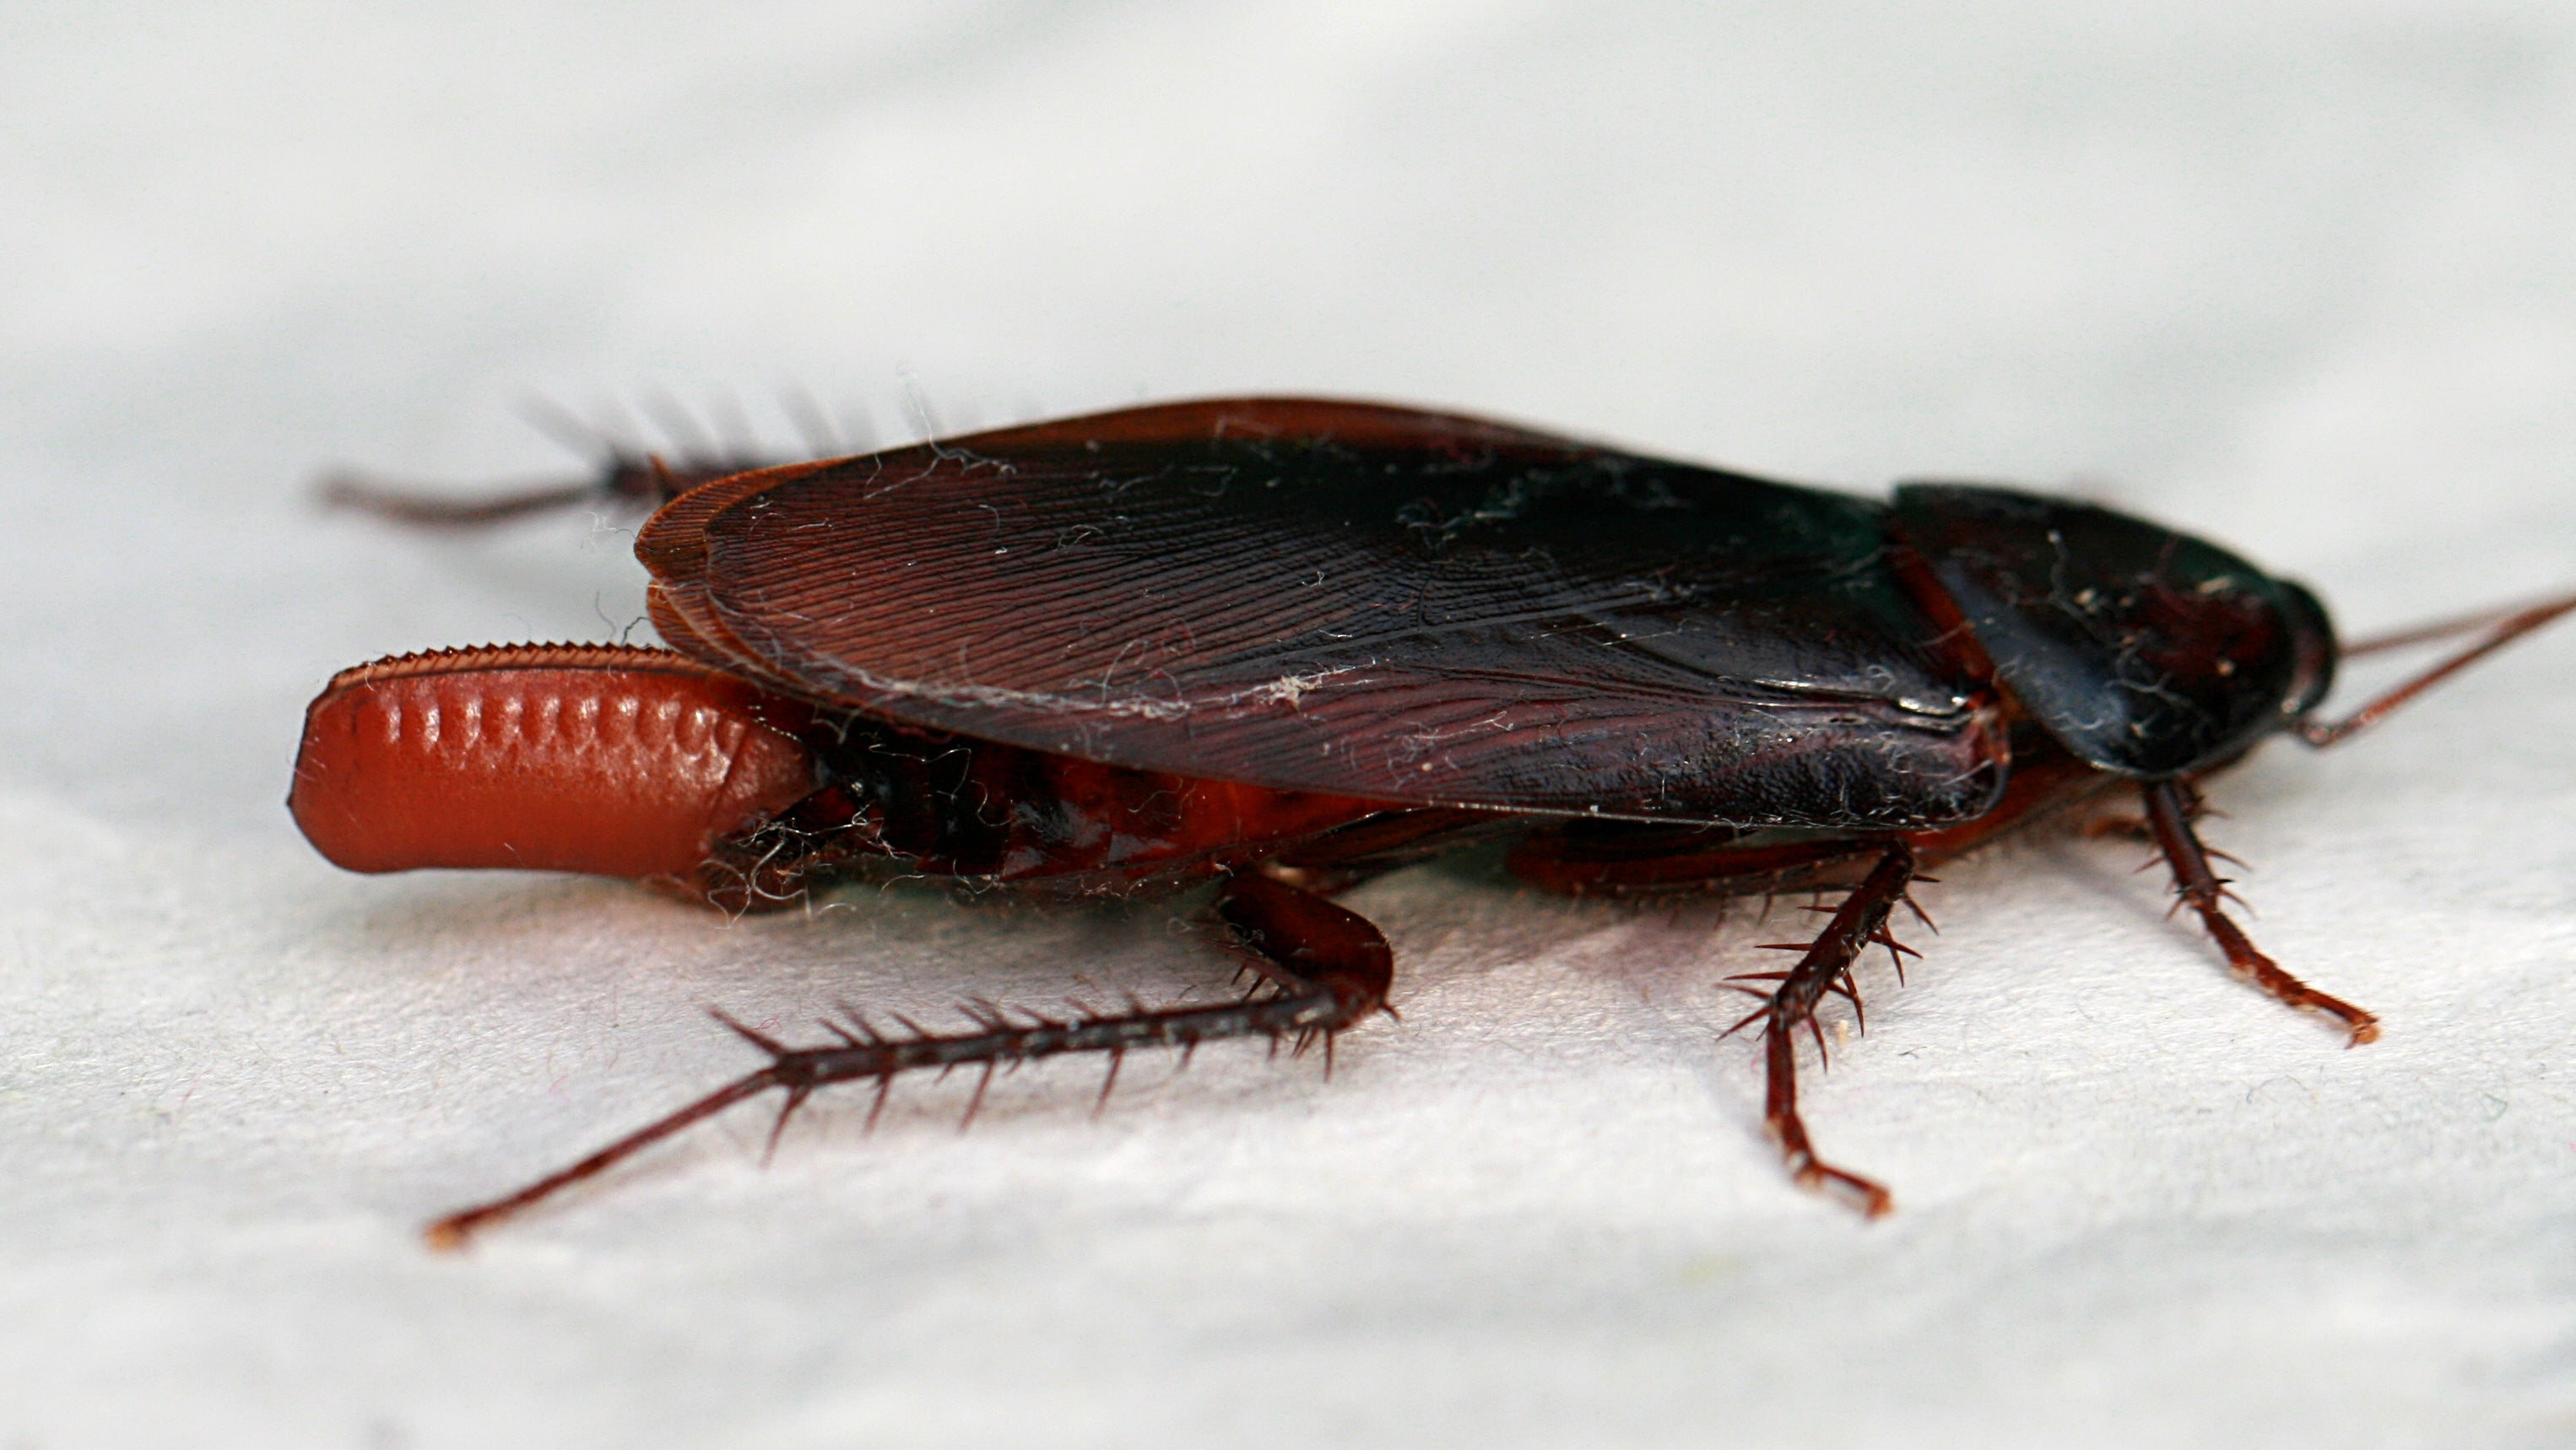 Man Says Dying Roach Left Eggs In His Ear: 'I Heard It Die In My Head'